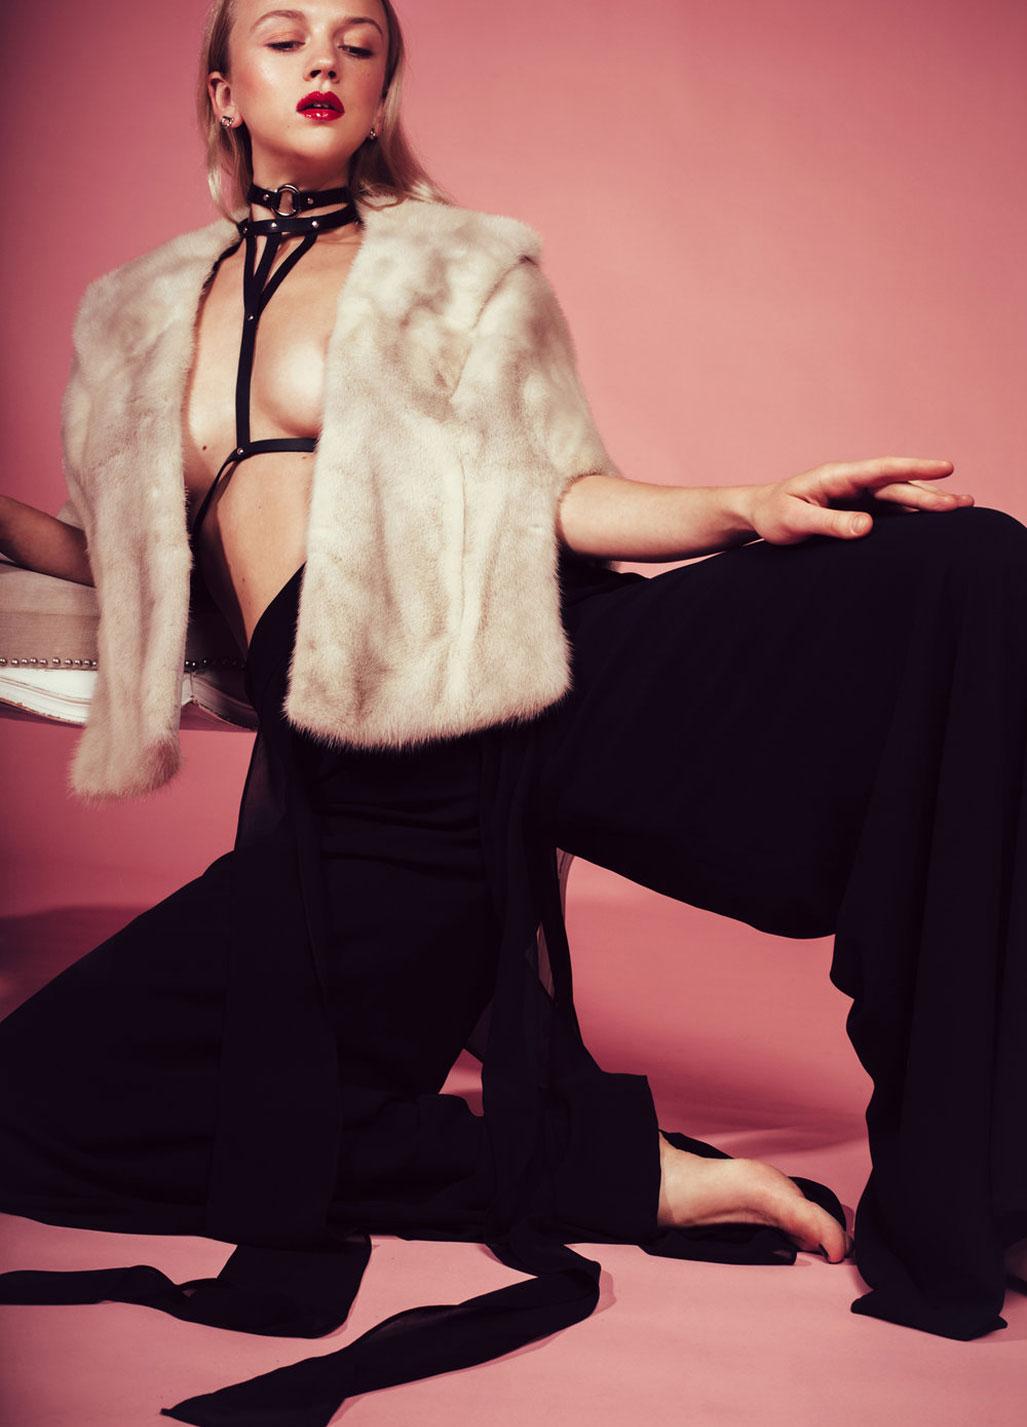 Светлана Легун в рекламной кампании Wicca collection 2016 / фото 11